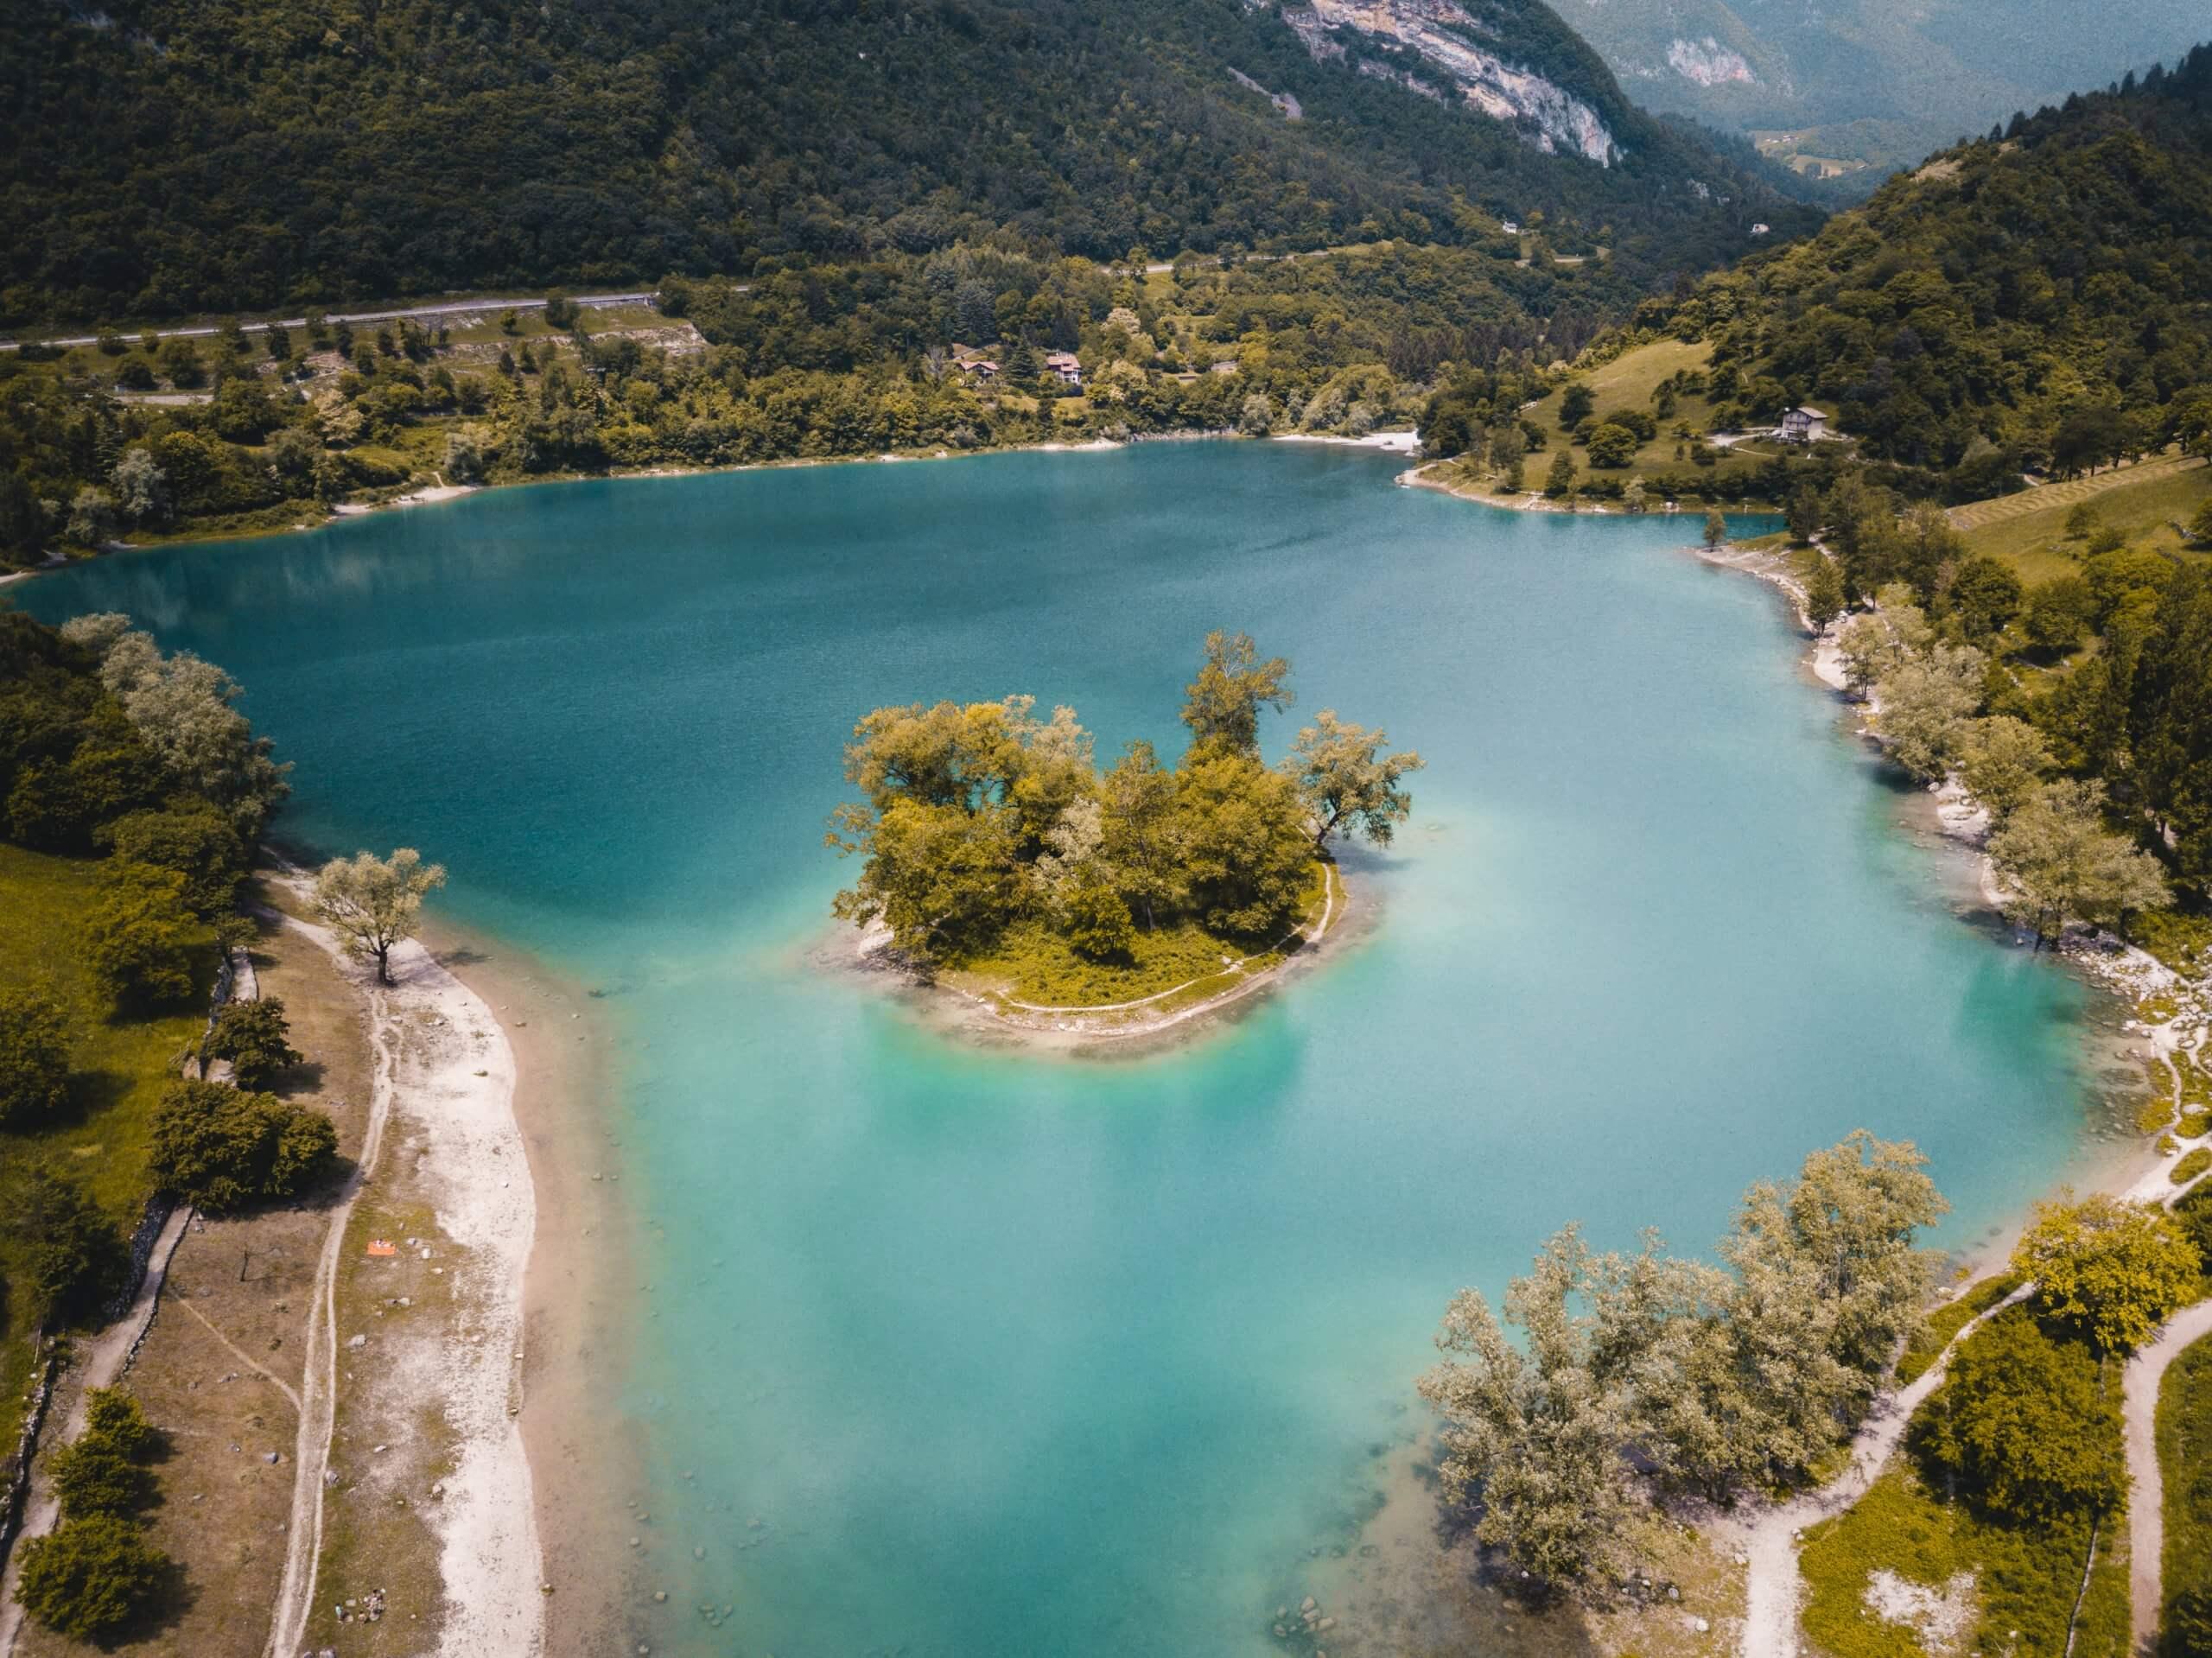 der blau leuchtende Lago di Tenno